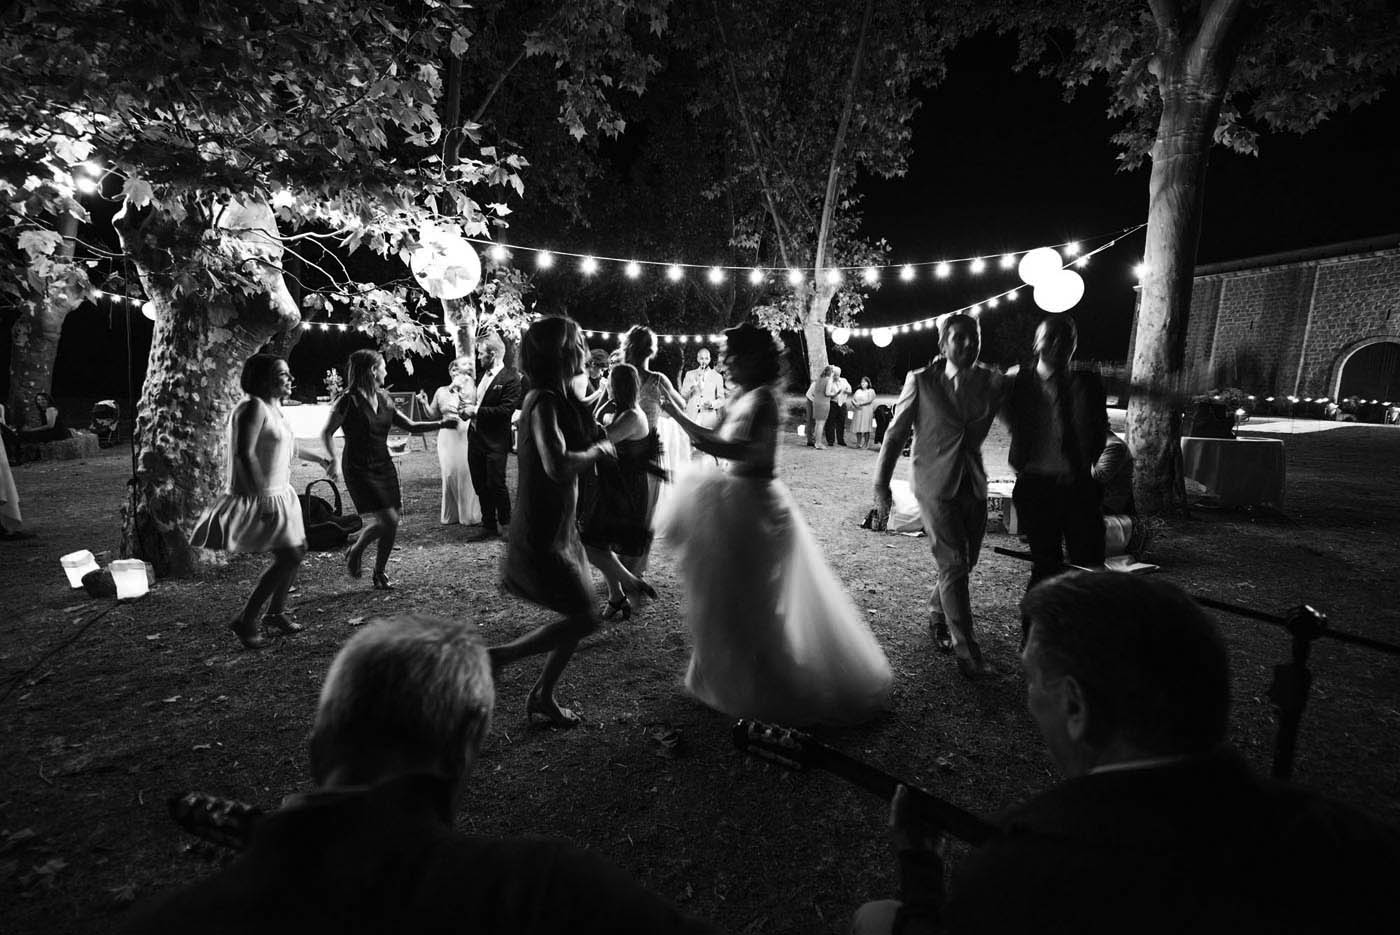 WEDDING-NIGHT-DANCING-CORSICA.jpg